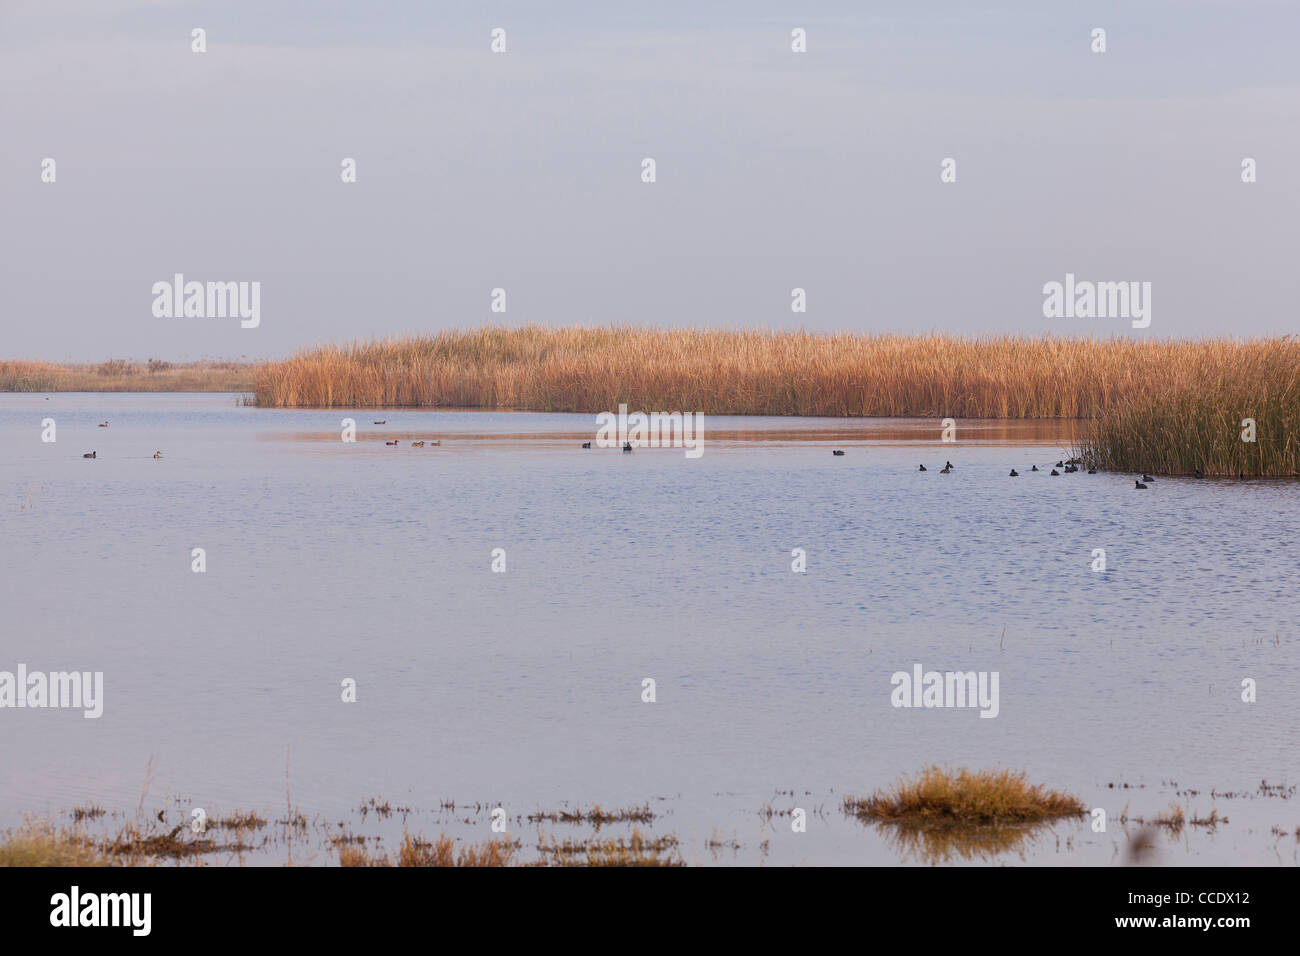 Grassy marshland - Stock Image